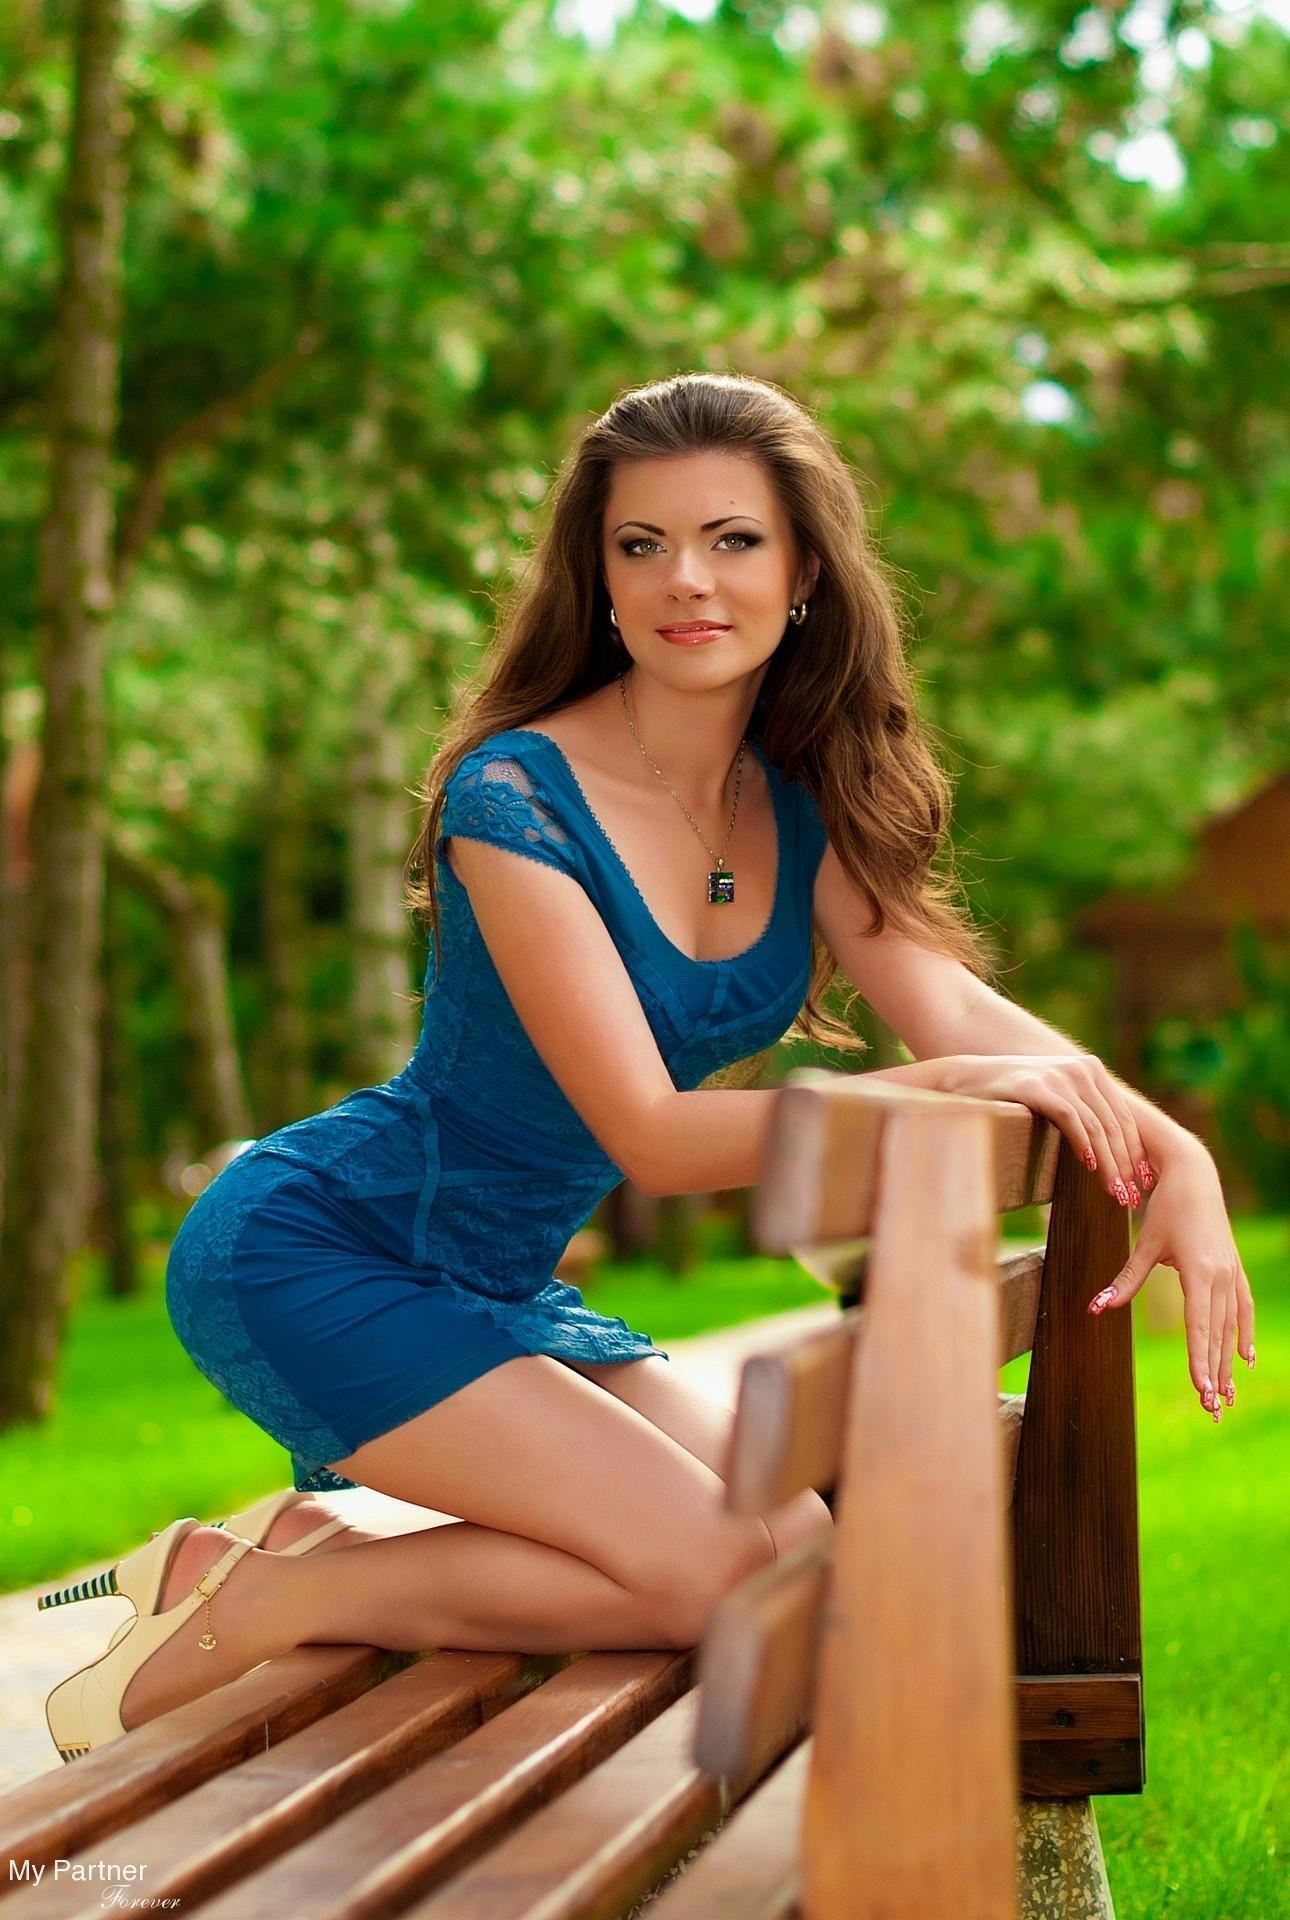 Ukrainien call girls russe